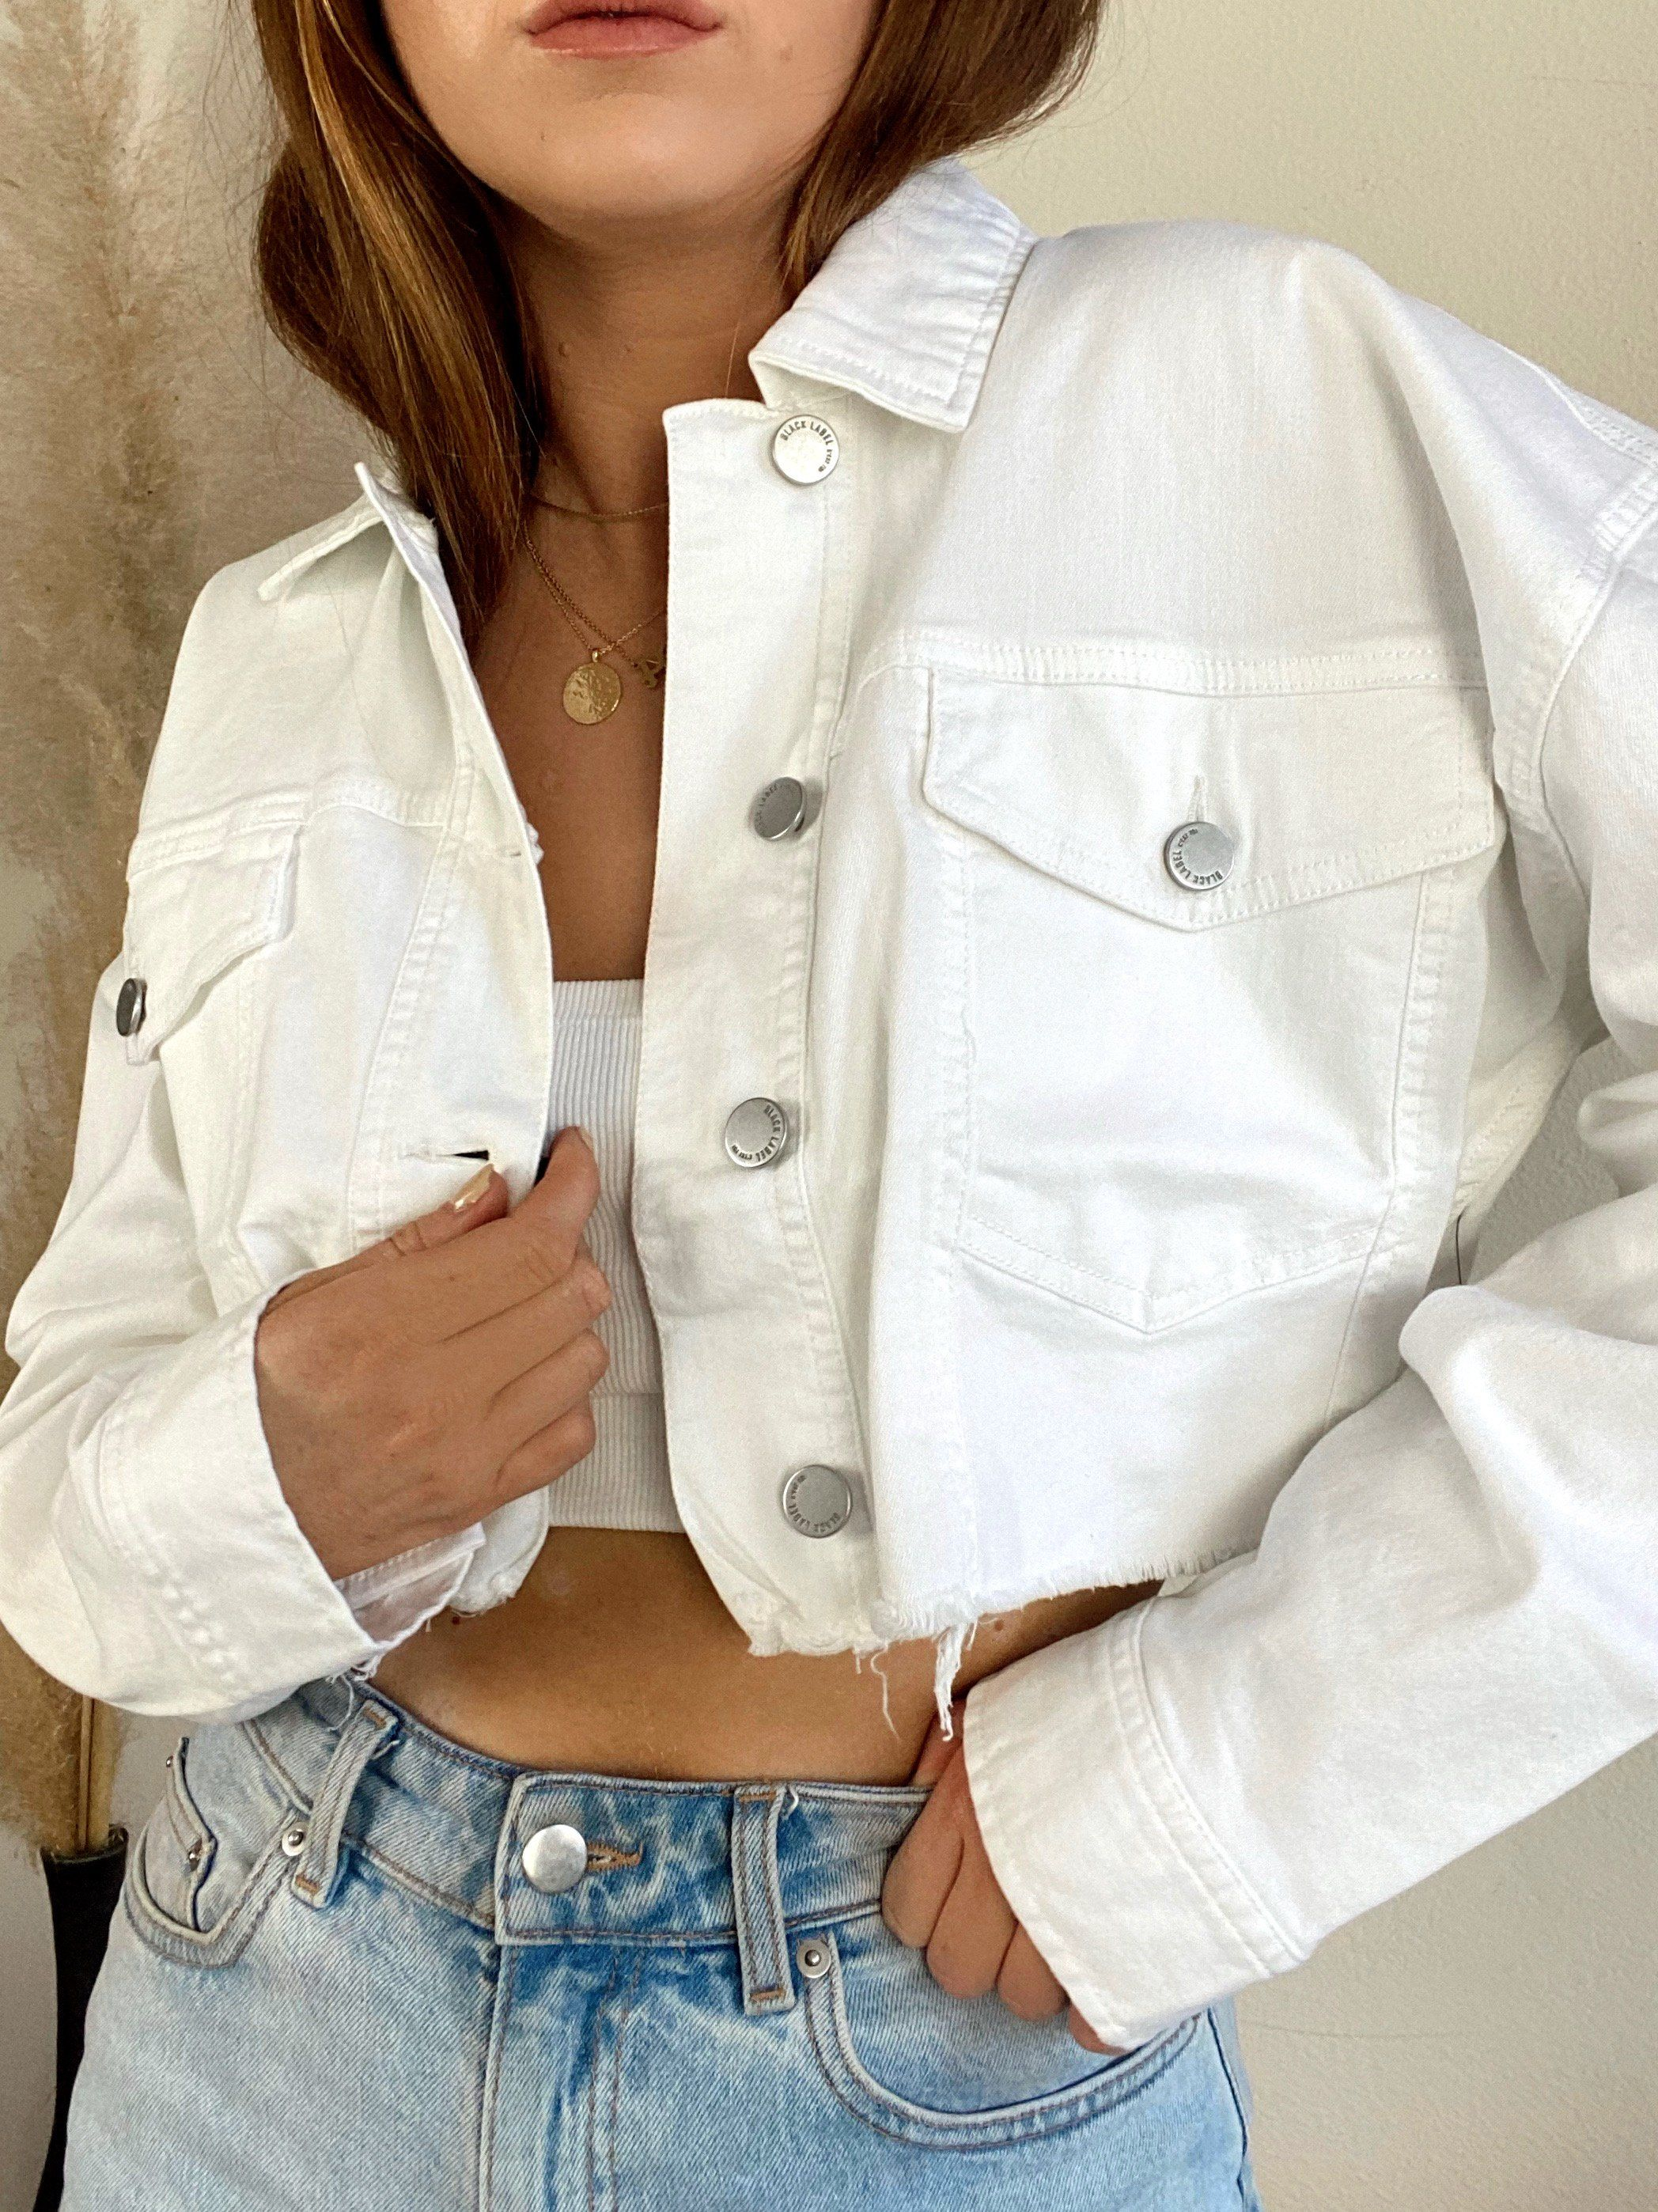 Castaway Cropped White Denim Jacket White Denim Jacket Outfit Cropped Jacket Outfit High Fashion Sweaters [ 2796 x 2096 Pixel ]